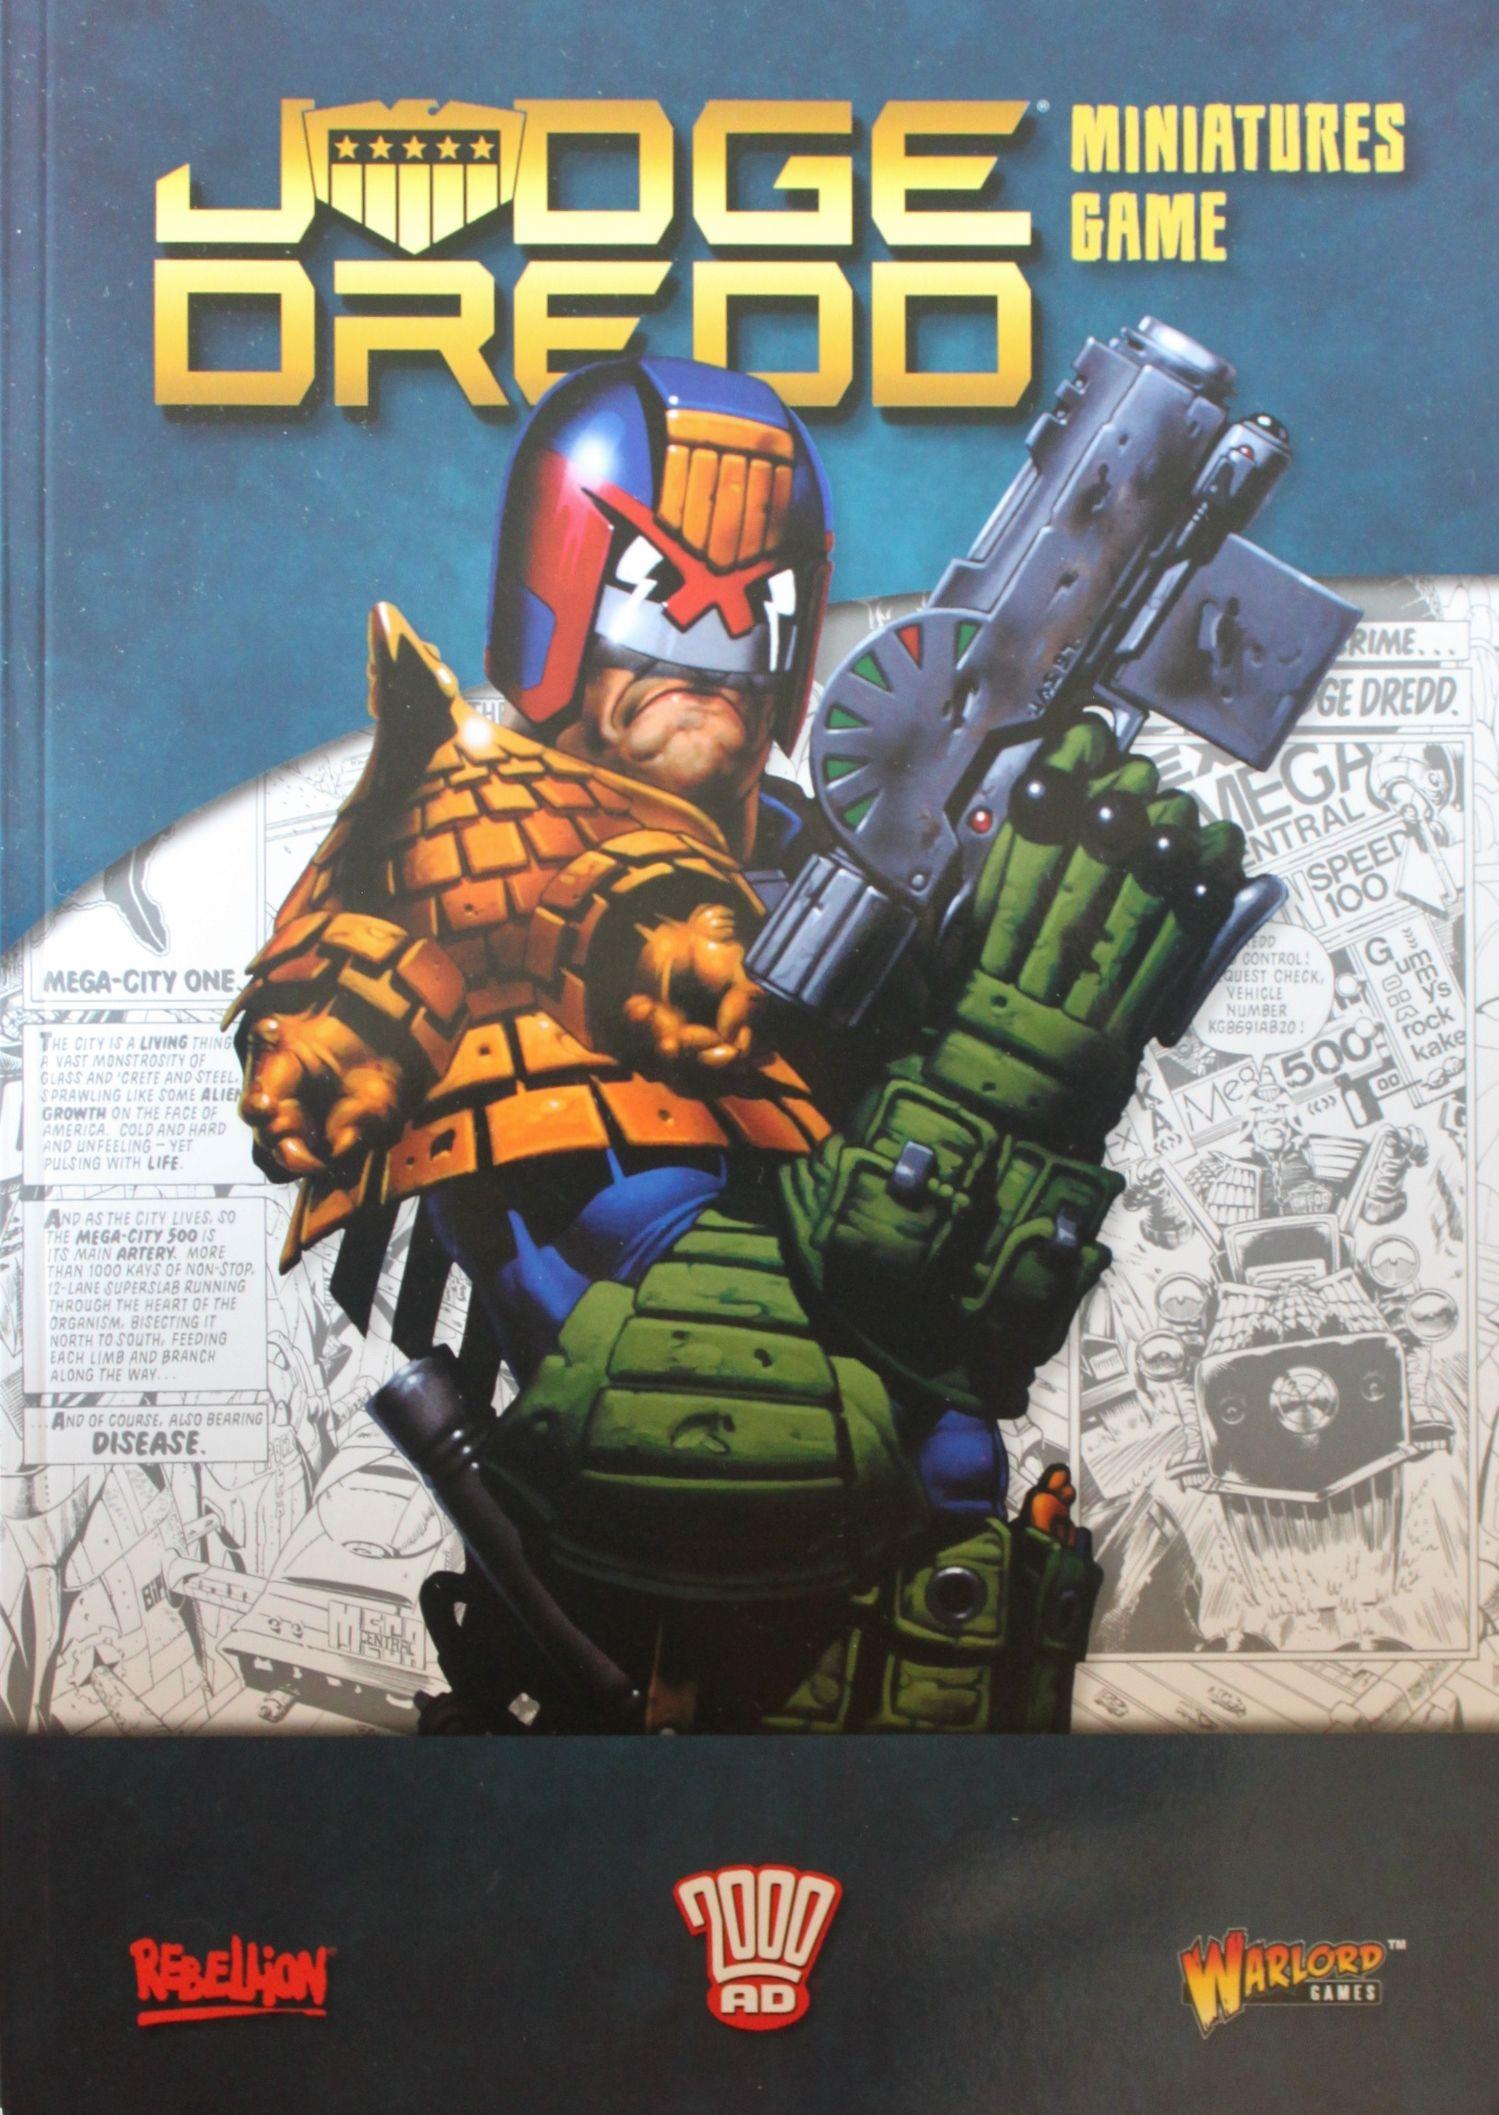 Judge Dredd Miniatures Game: Rulebook